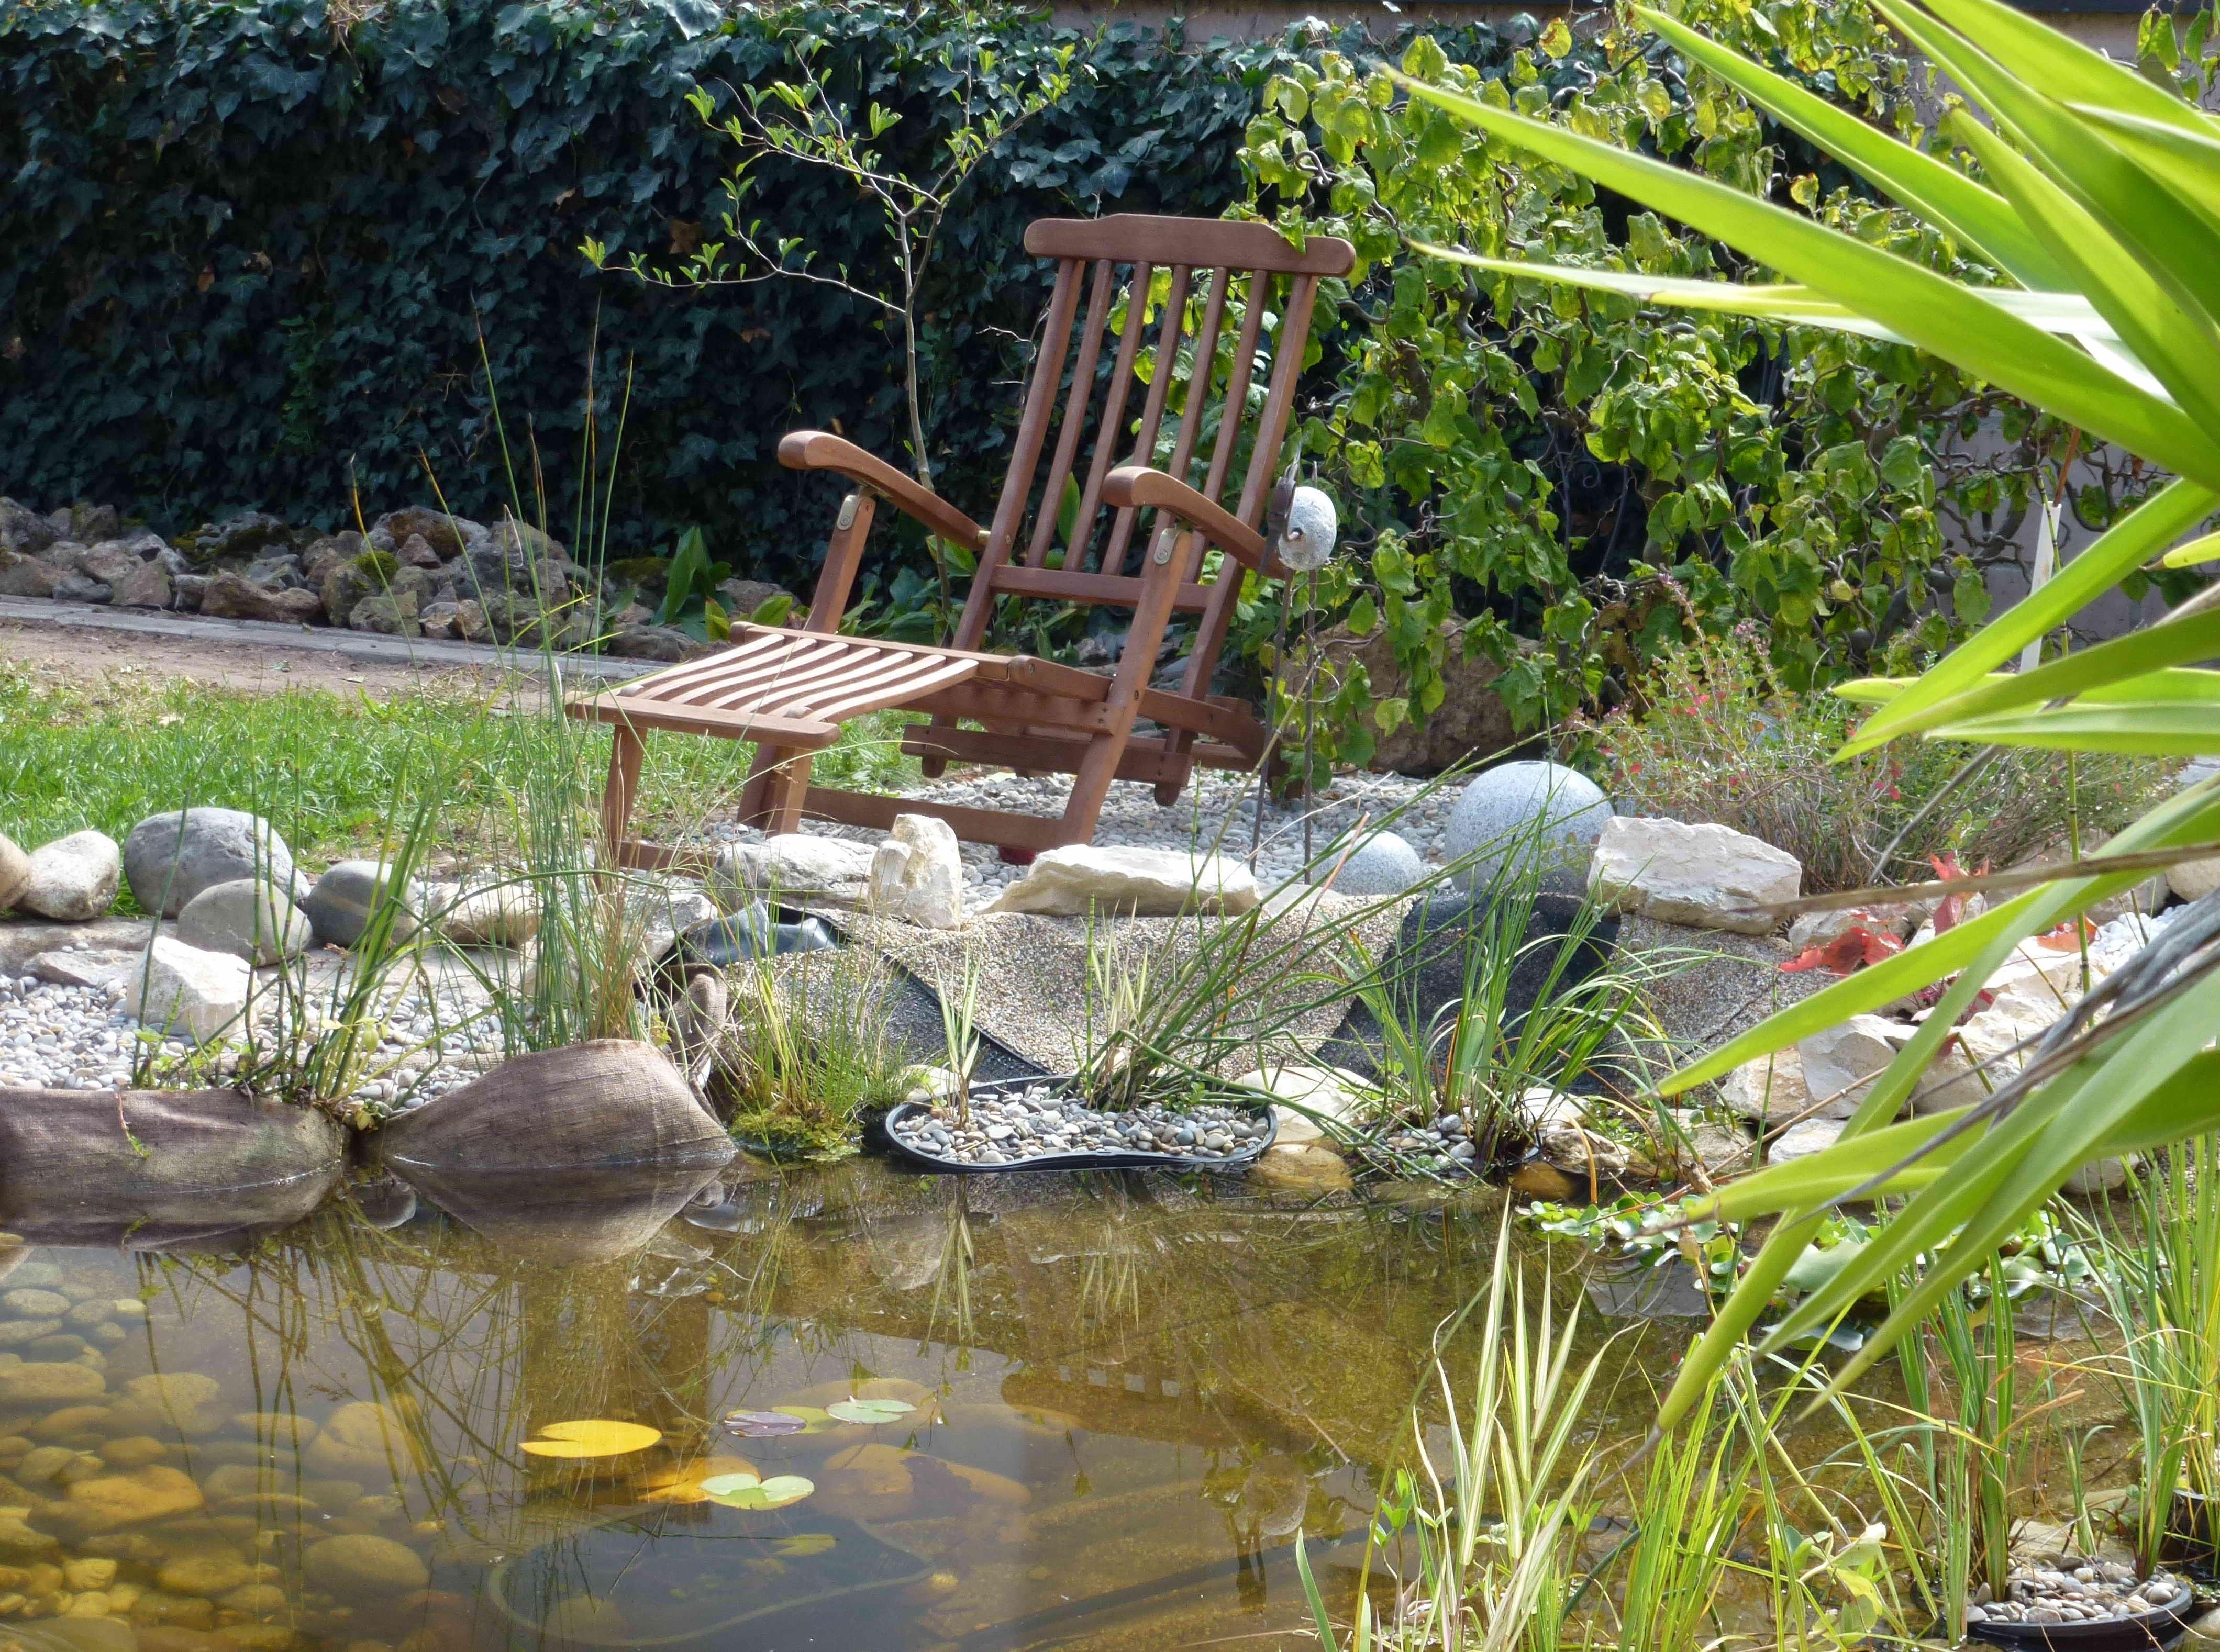 Holzliegestuhl am Teich